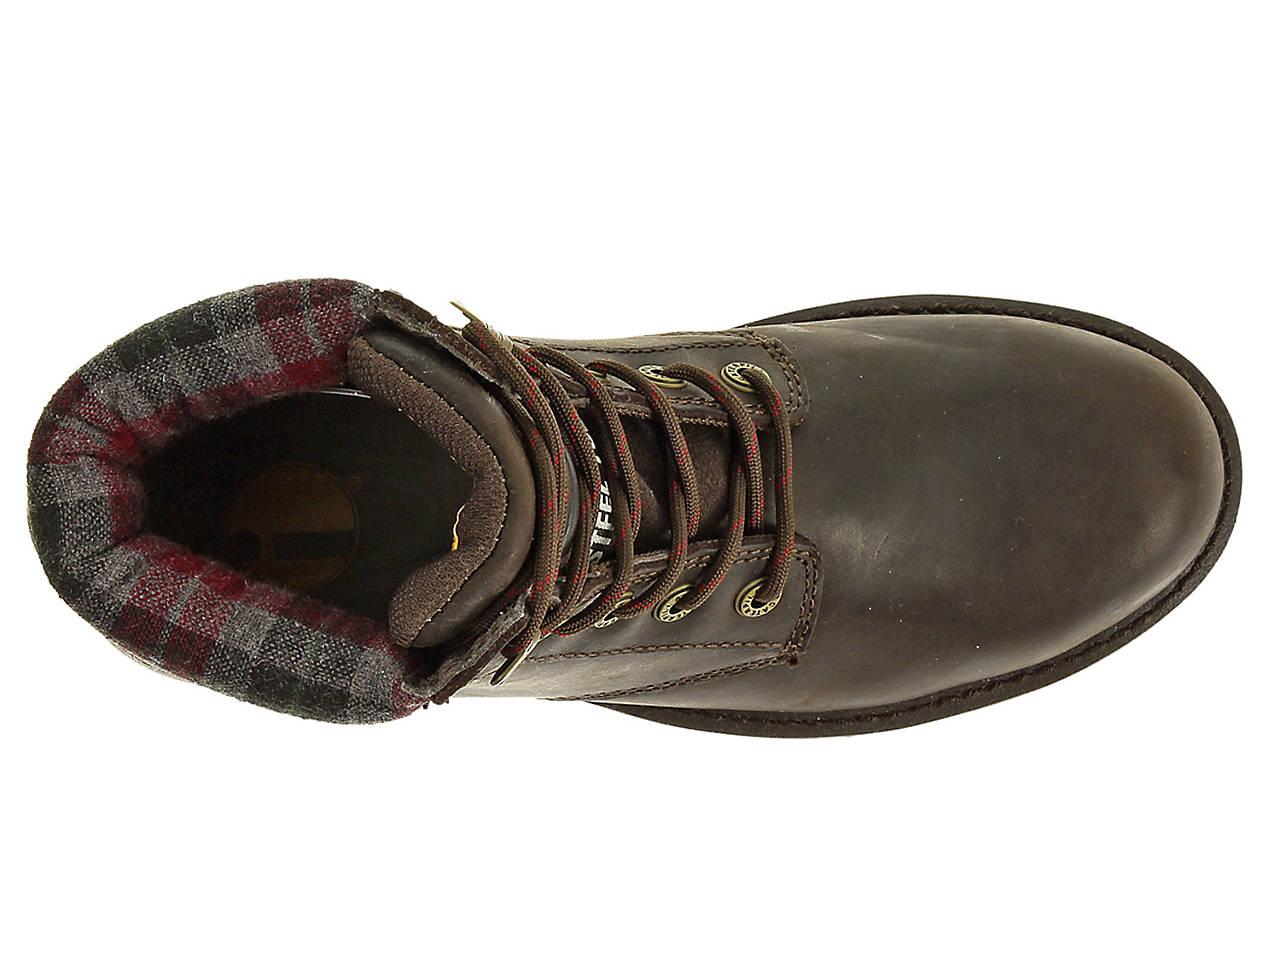 online enjoy discount price shop for Caterpillar Kenzie Work Boot Women's Shoes | DSW